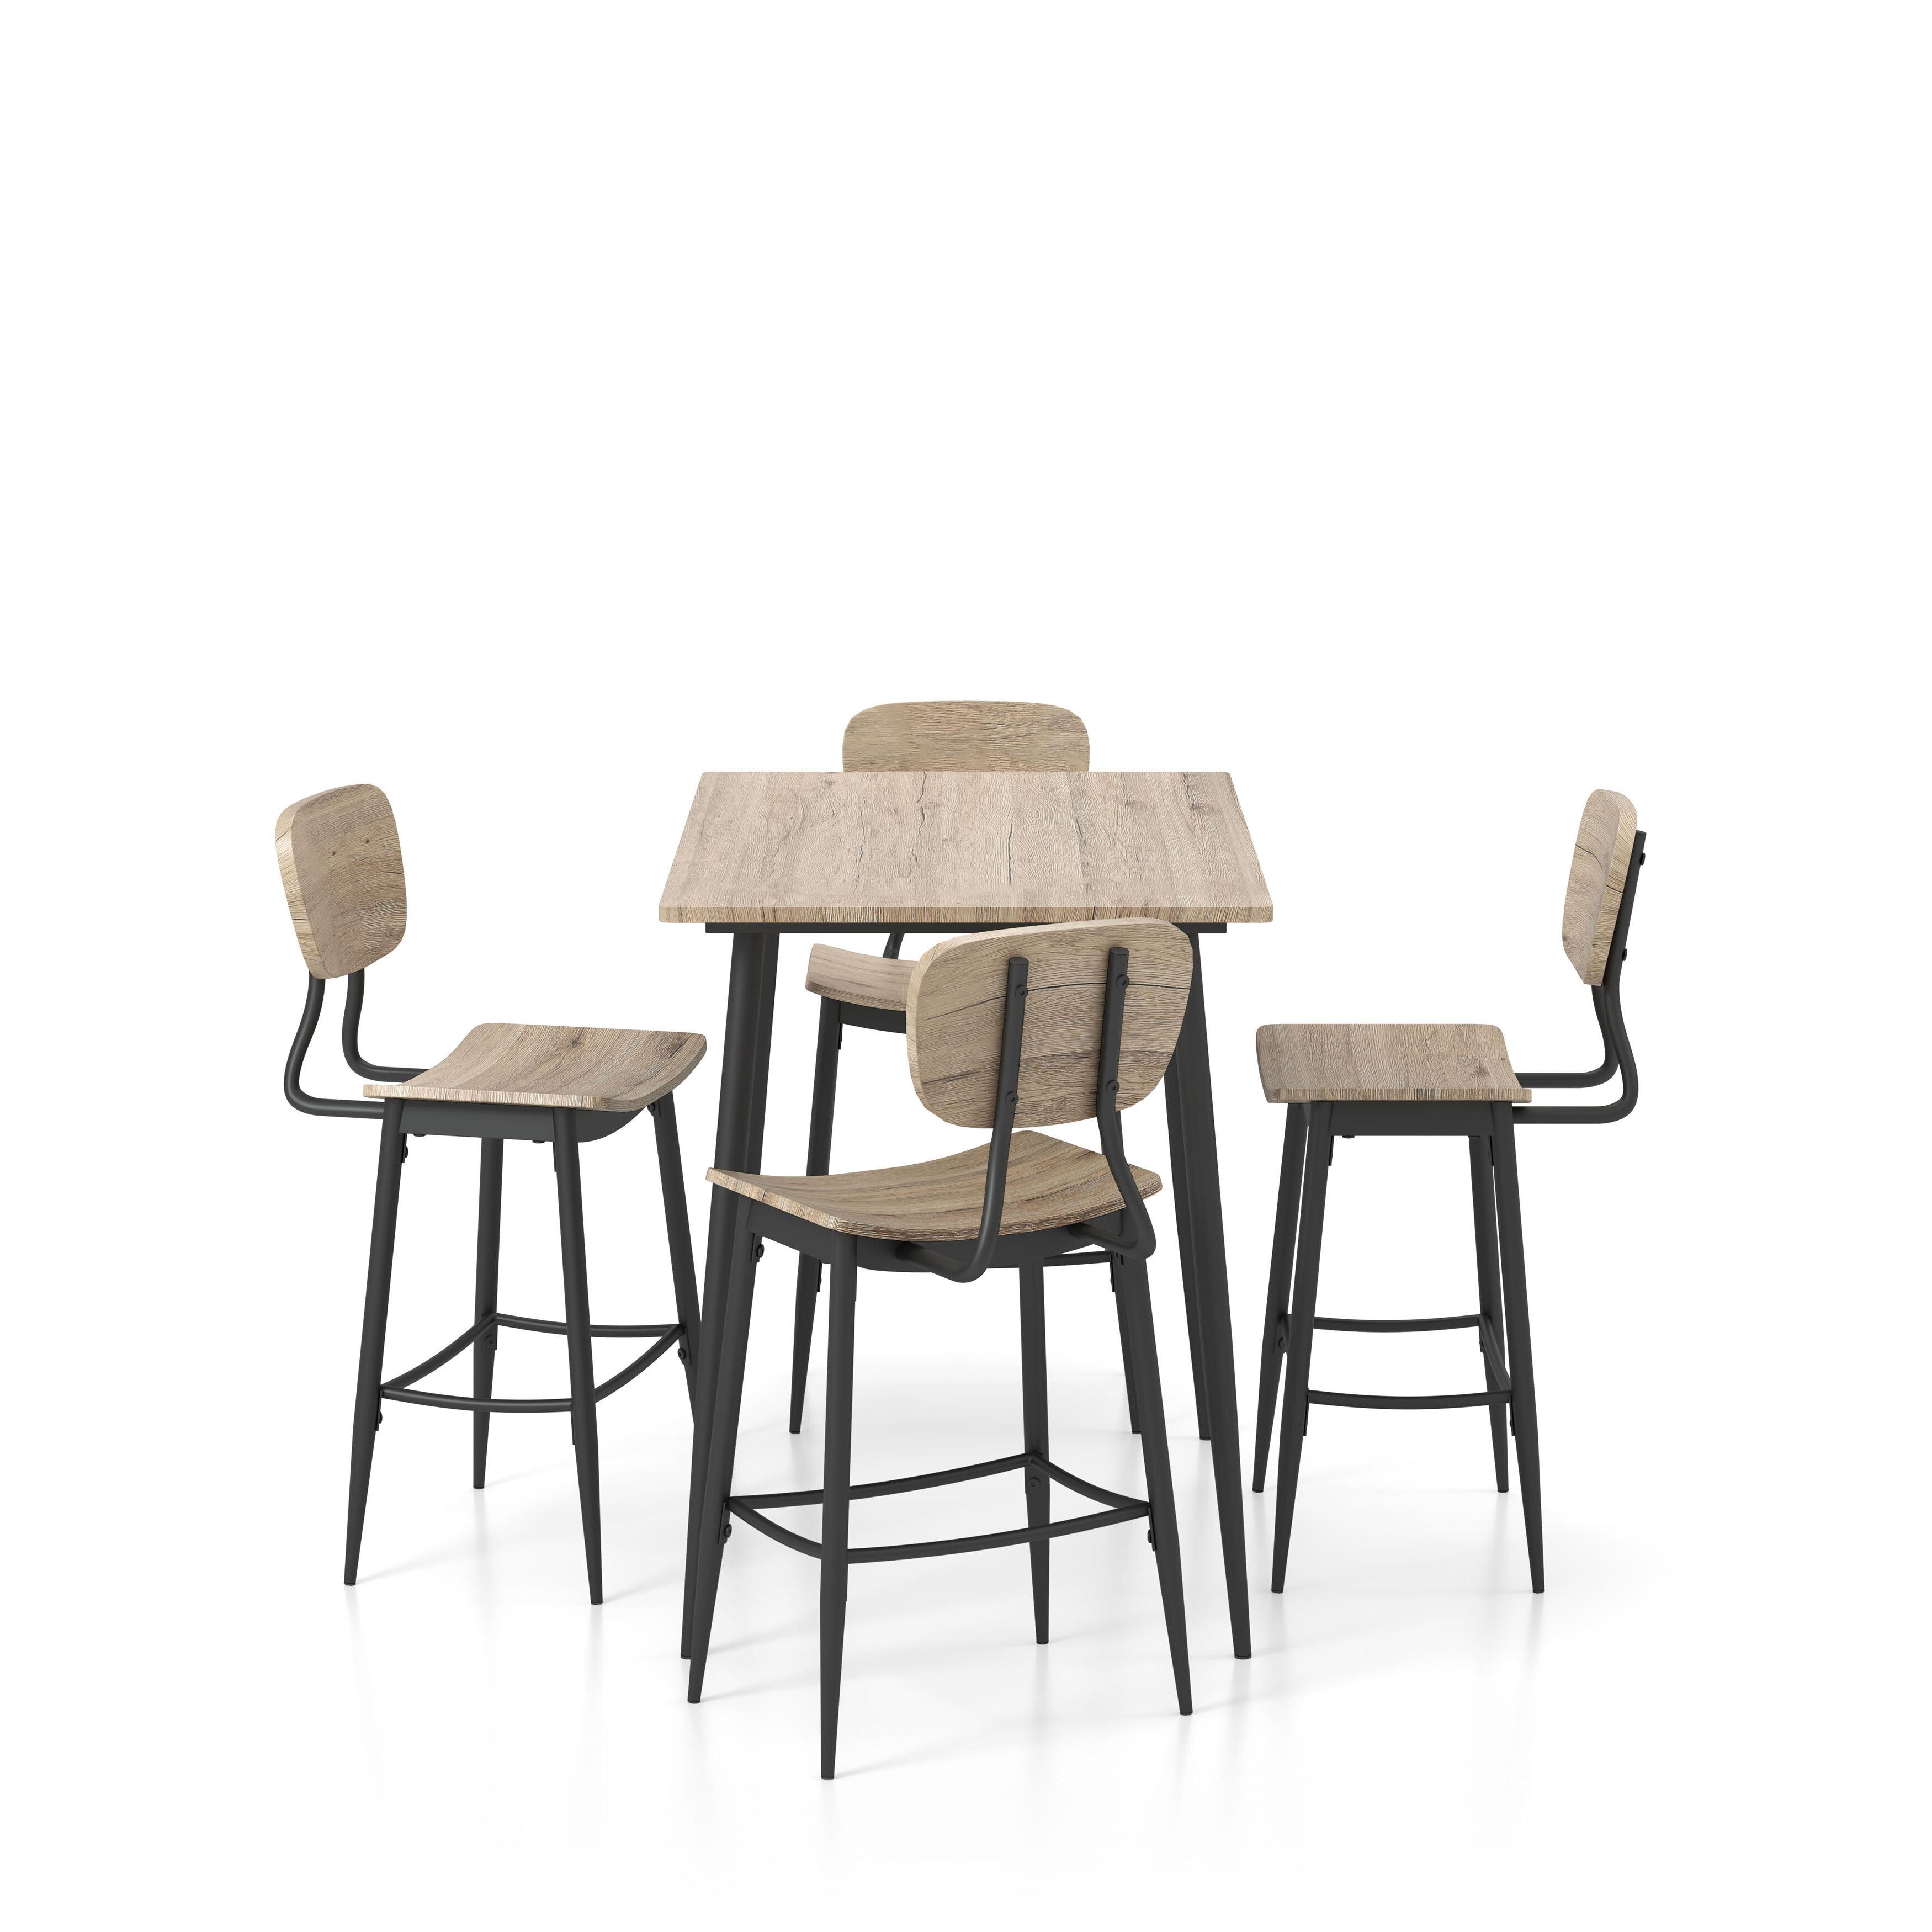 White Cane Outdoor Furniture, Corrigan Studio Pafford 5 Piece Counter Height Dining Set Wayfair